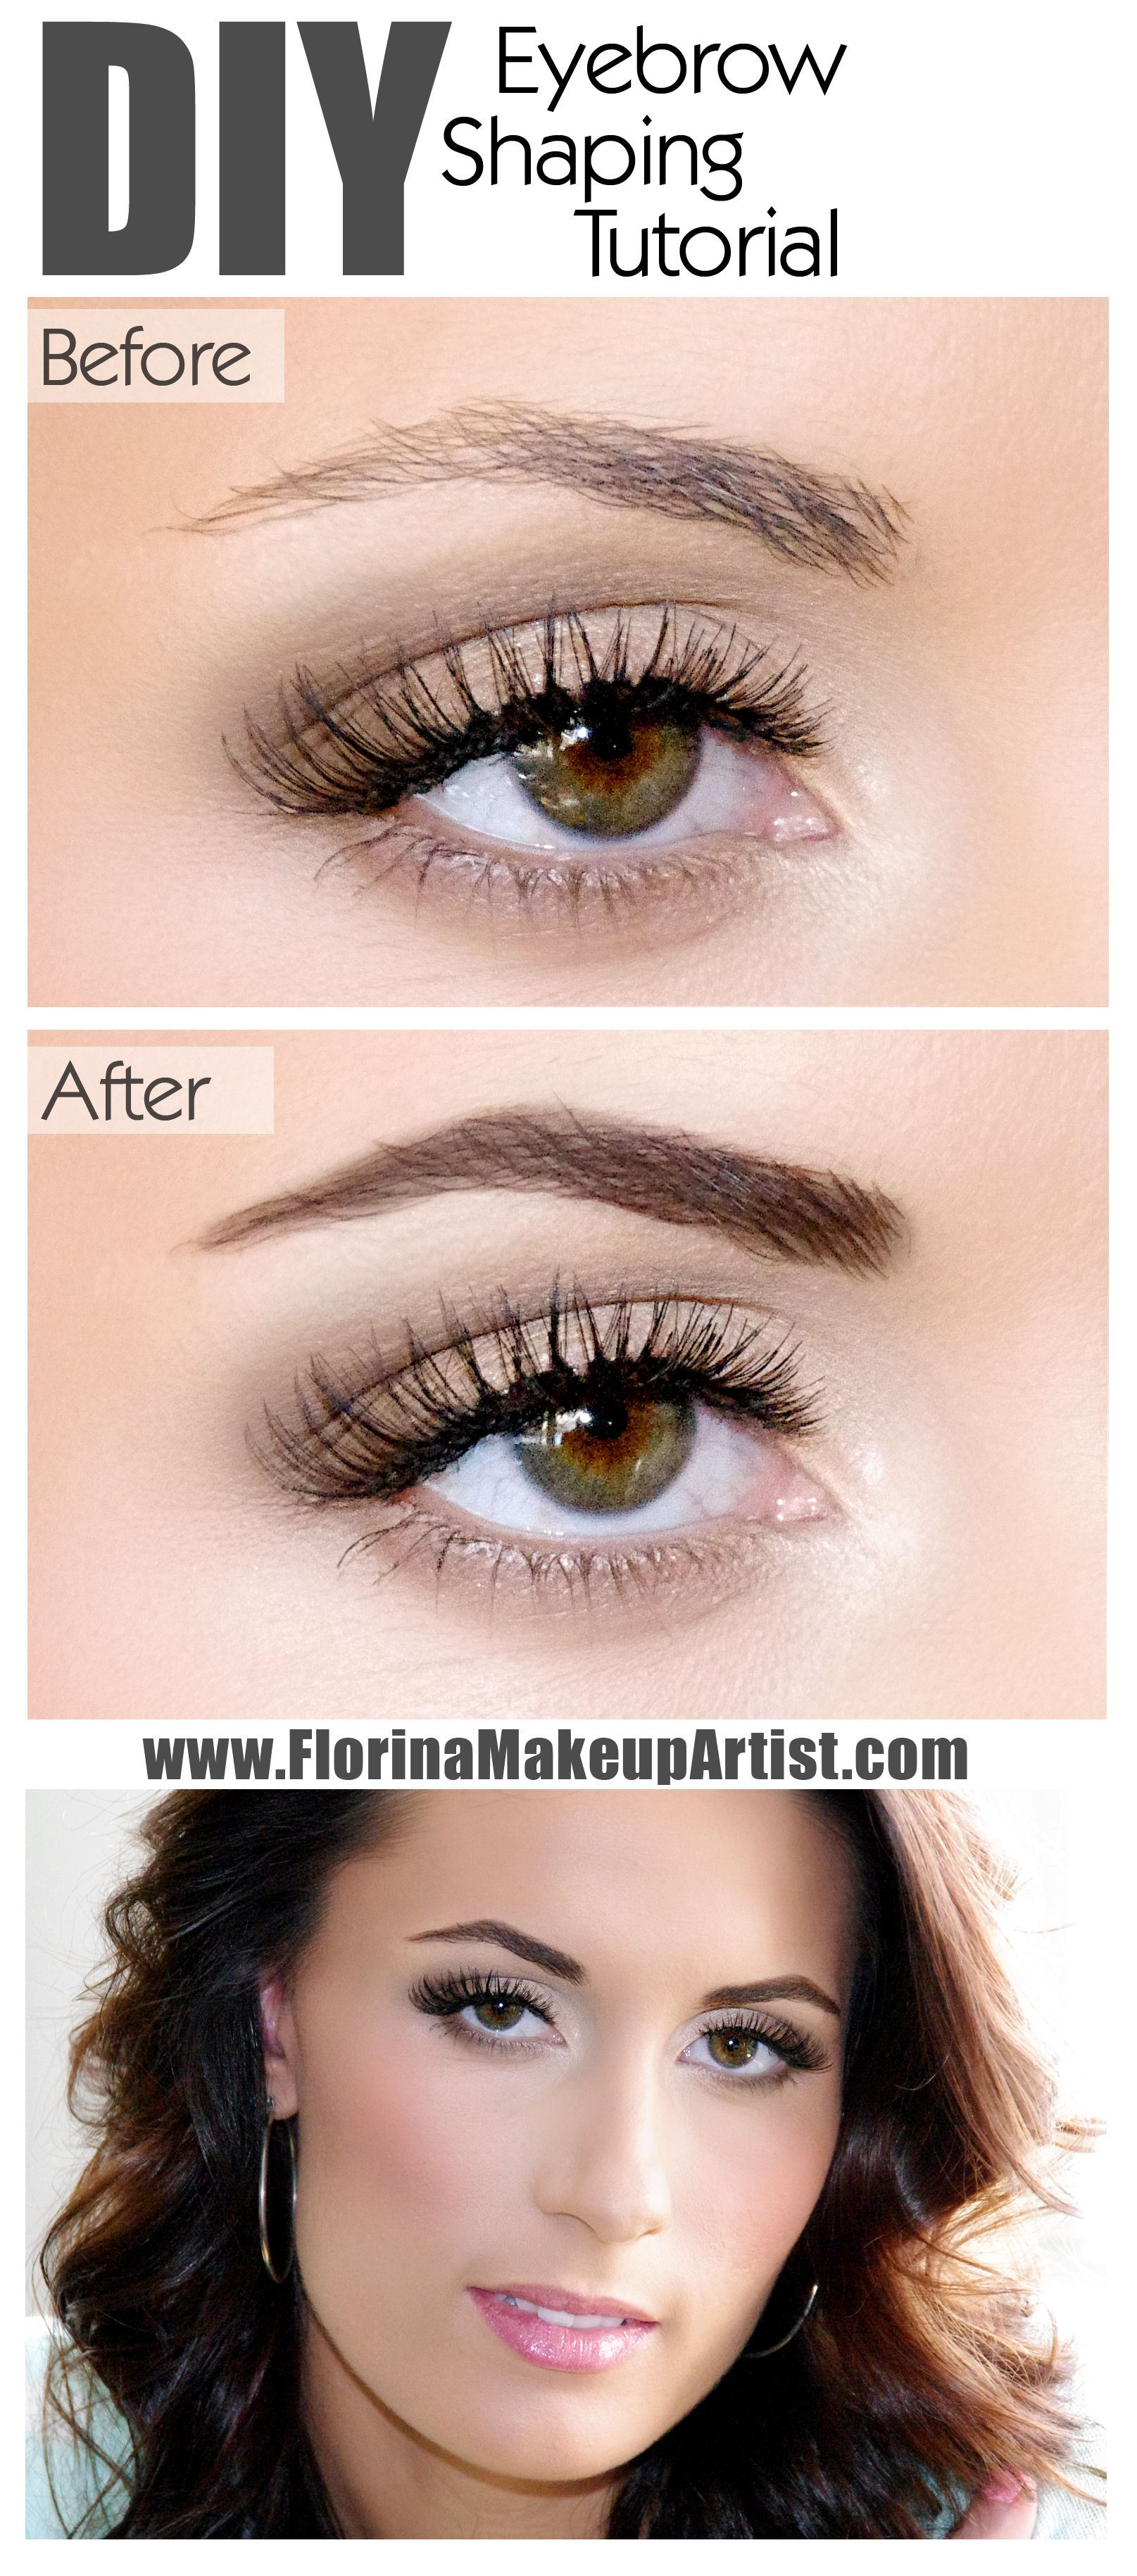 Eyebrow Tutorial: Eyebrow Shaping Tutorial Perfect Natural Eyebrows